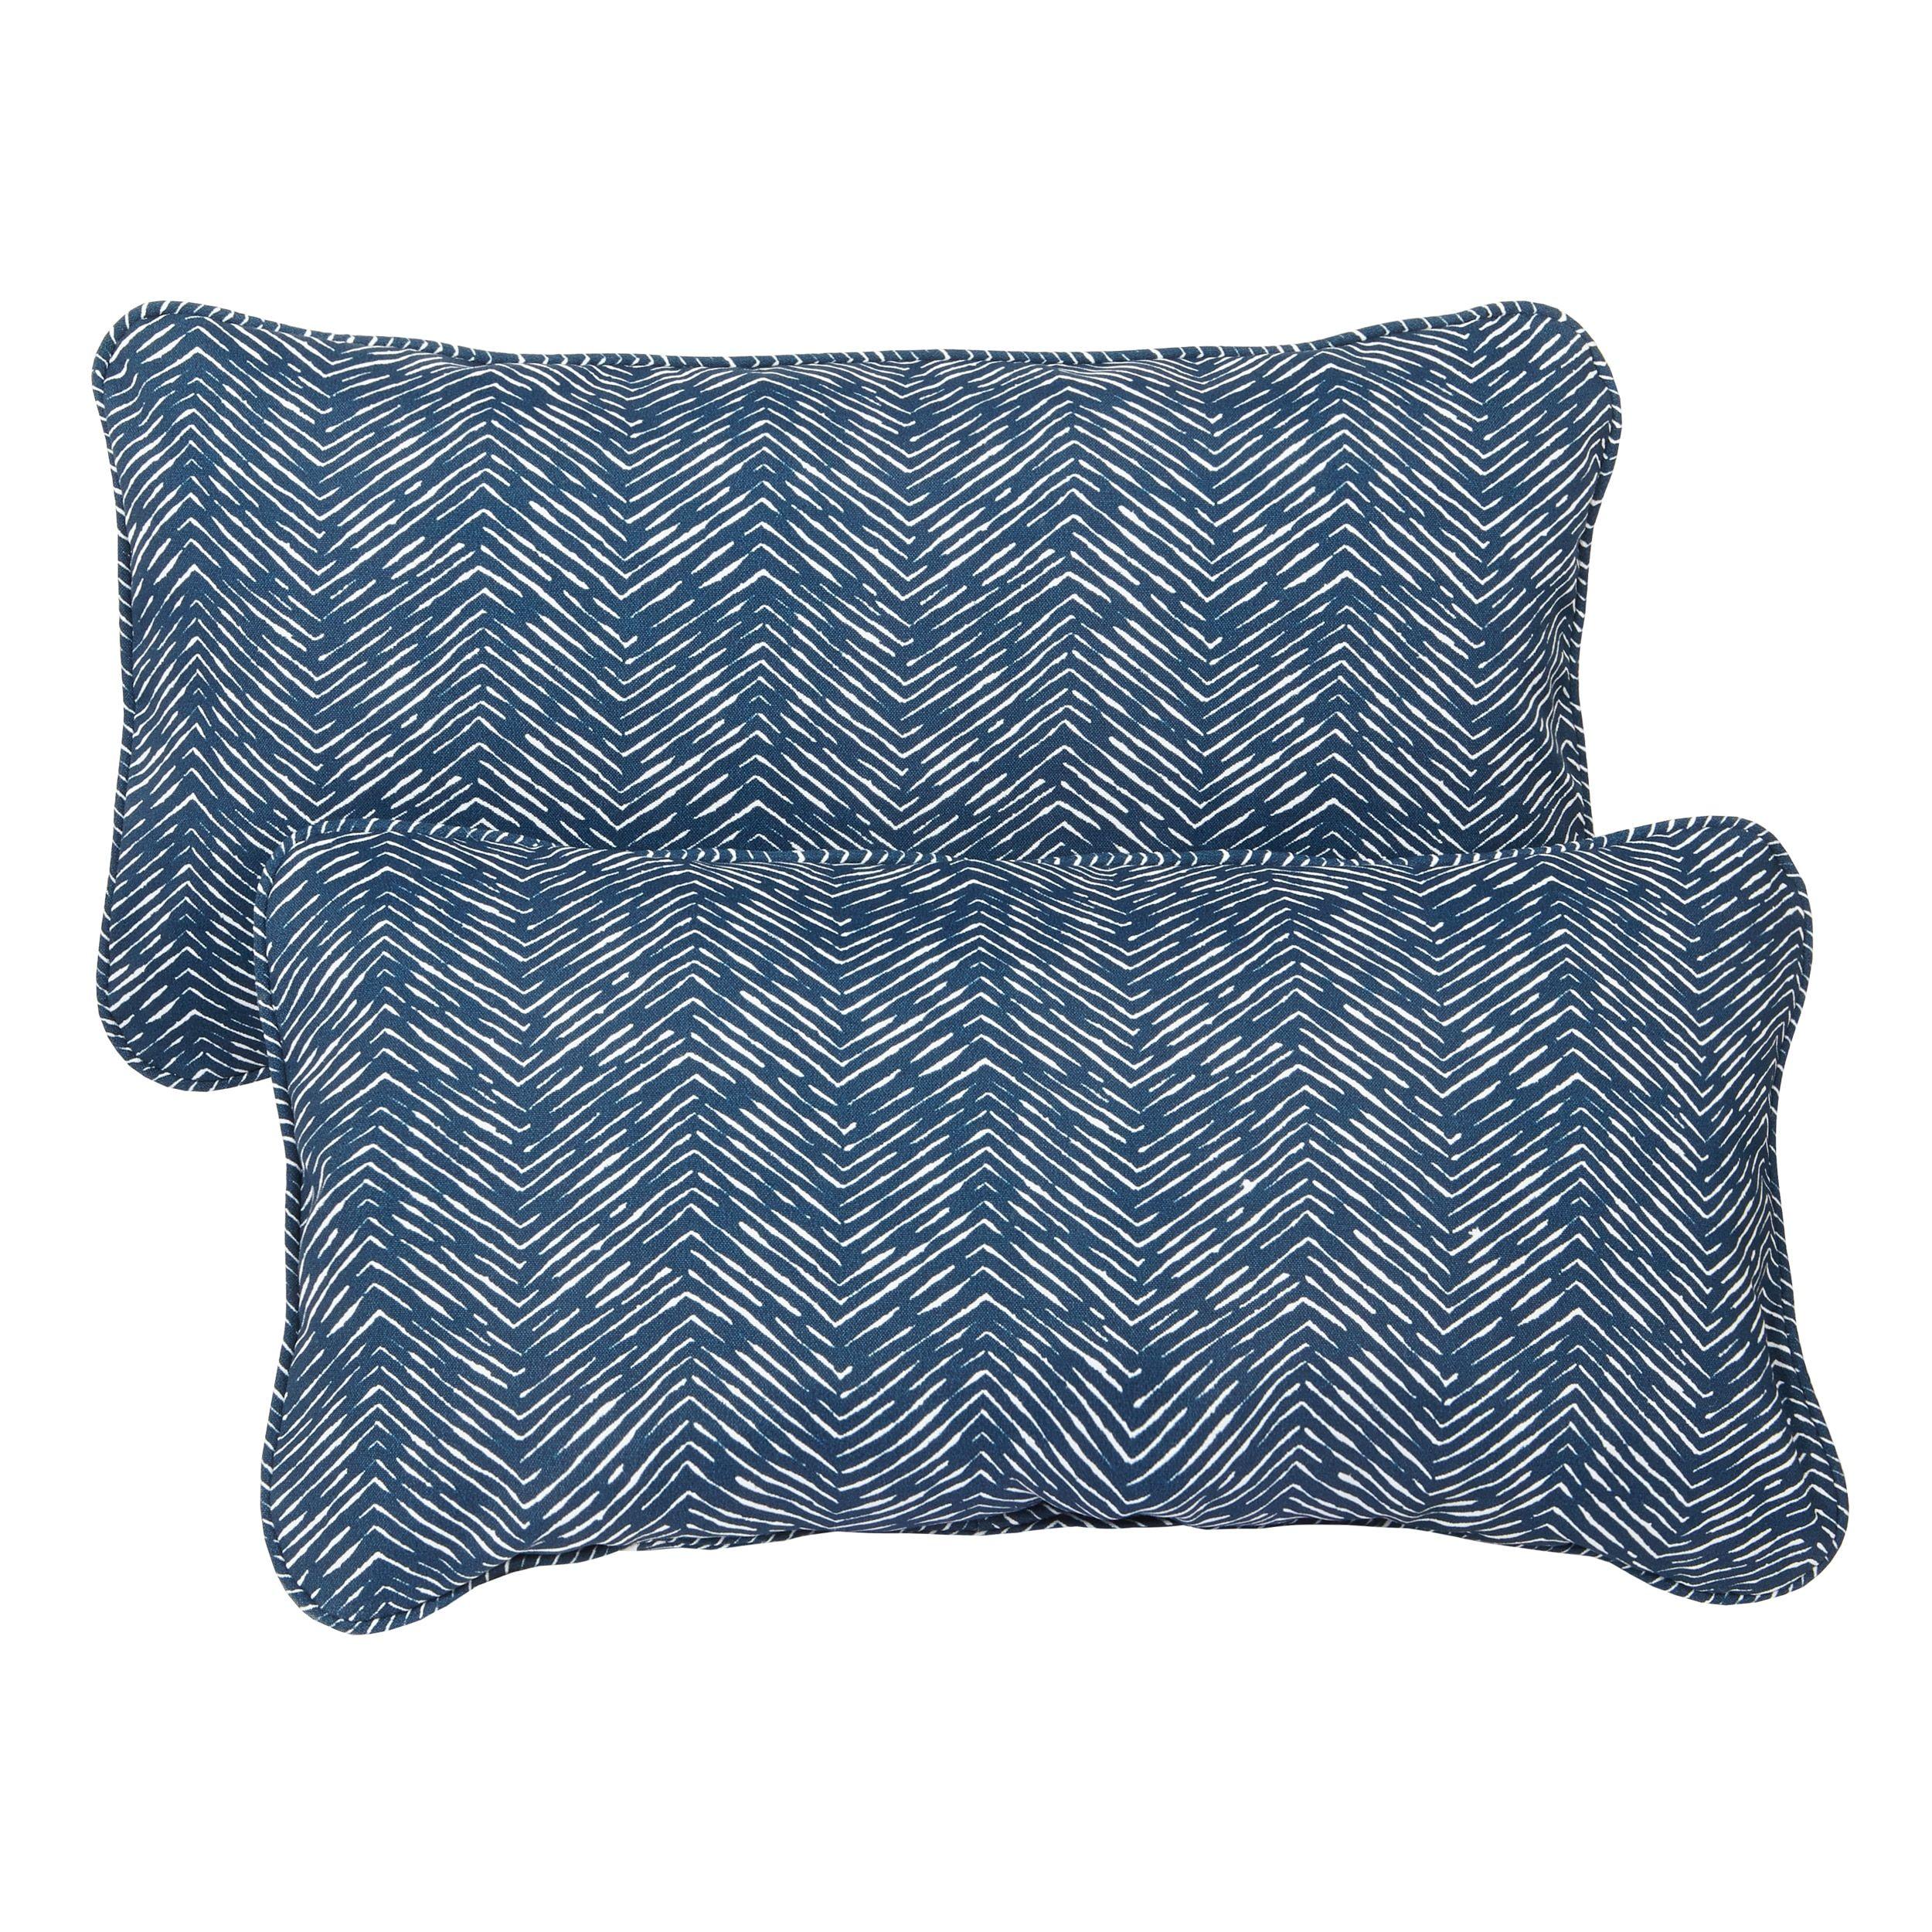 home of gallery pillows goods pillow brilliant decorative throw ideas blanket cushion design